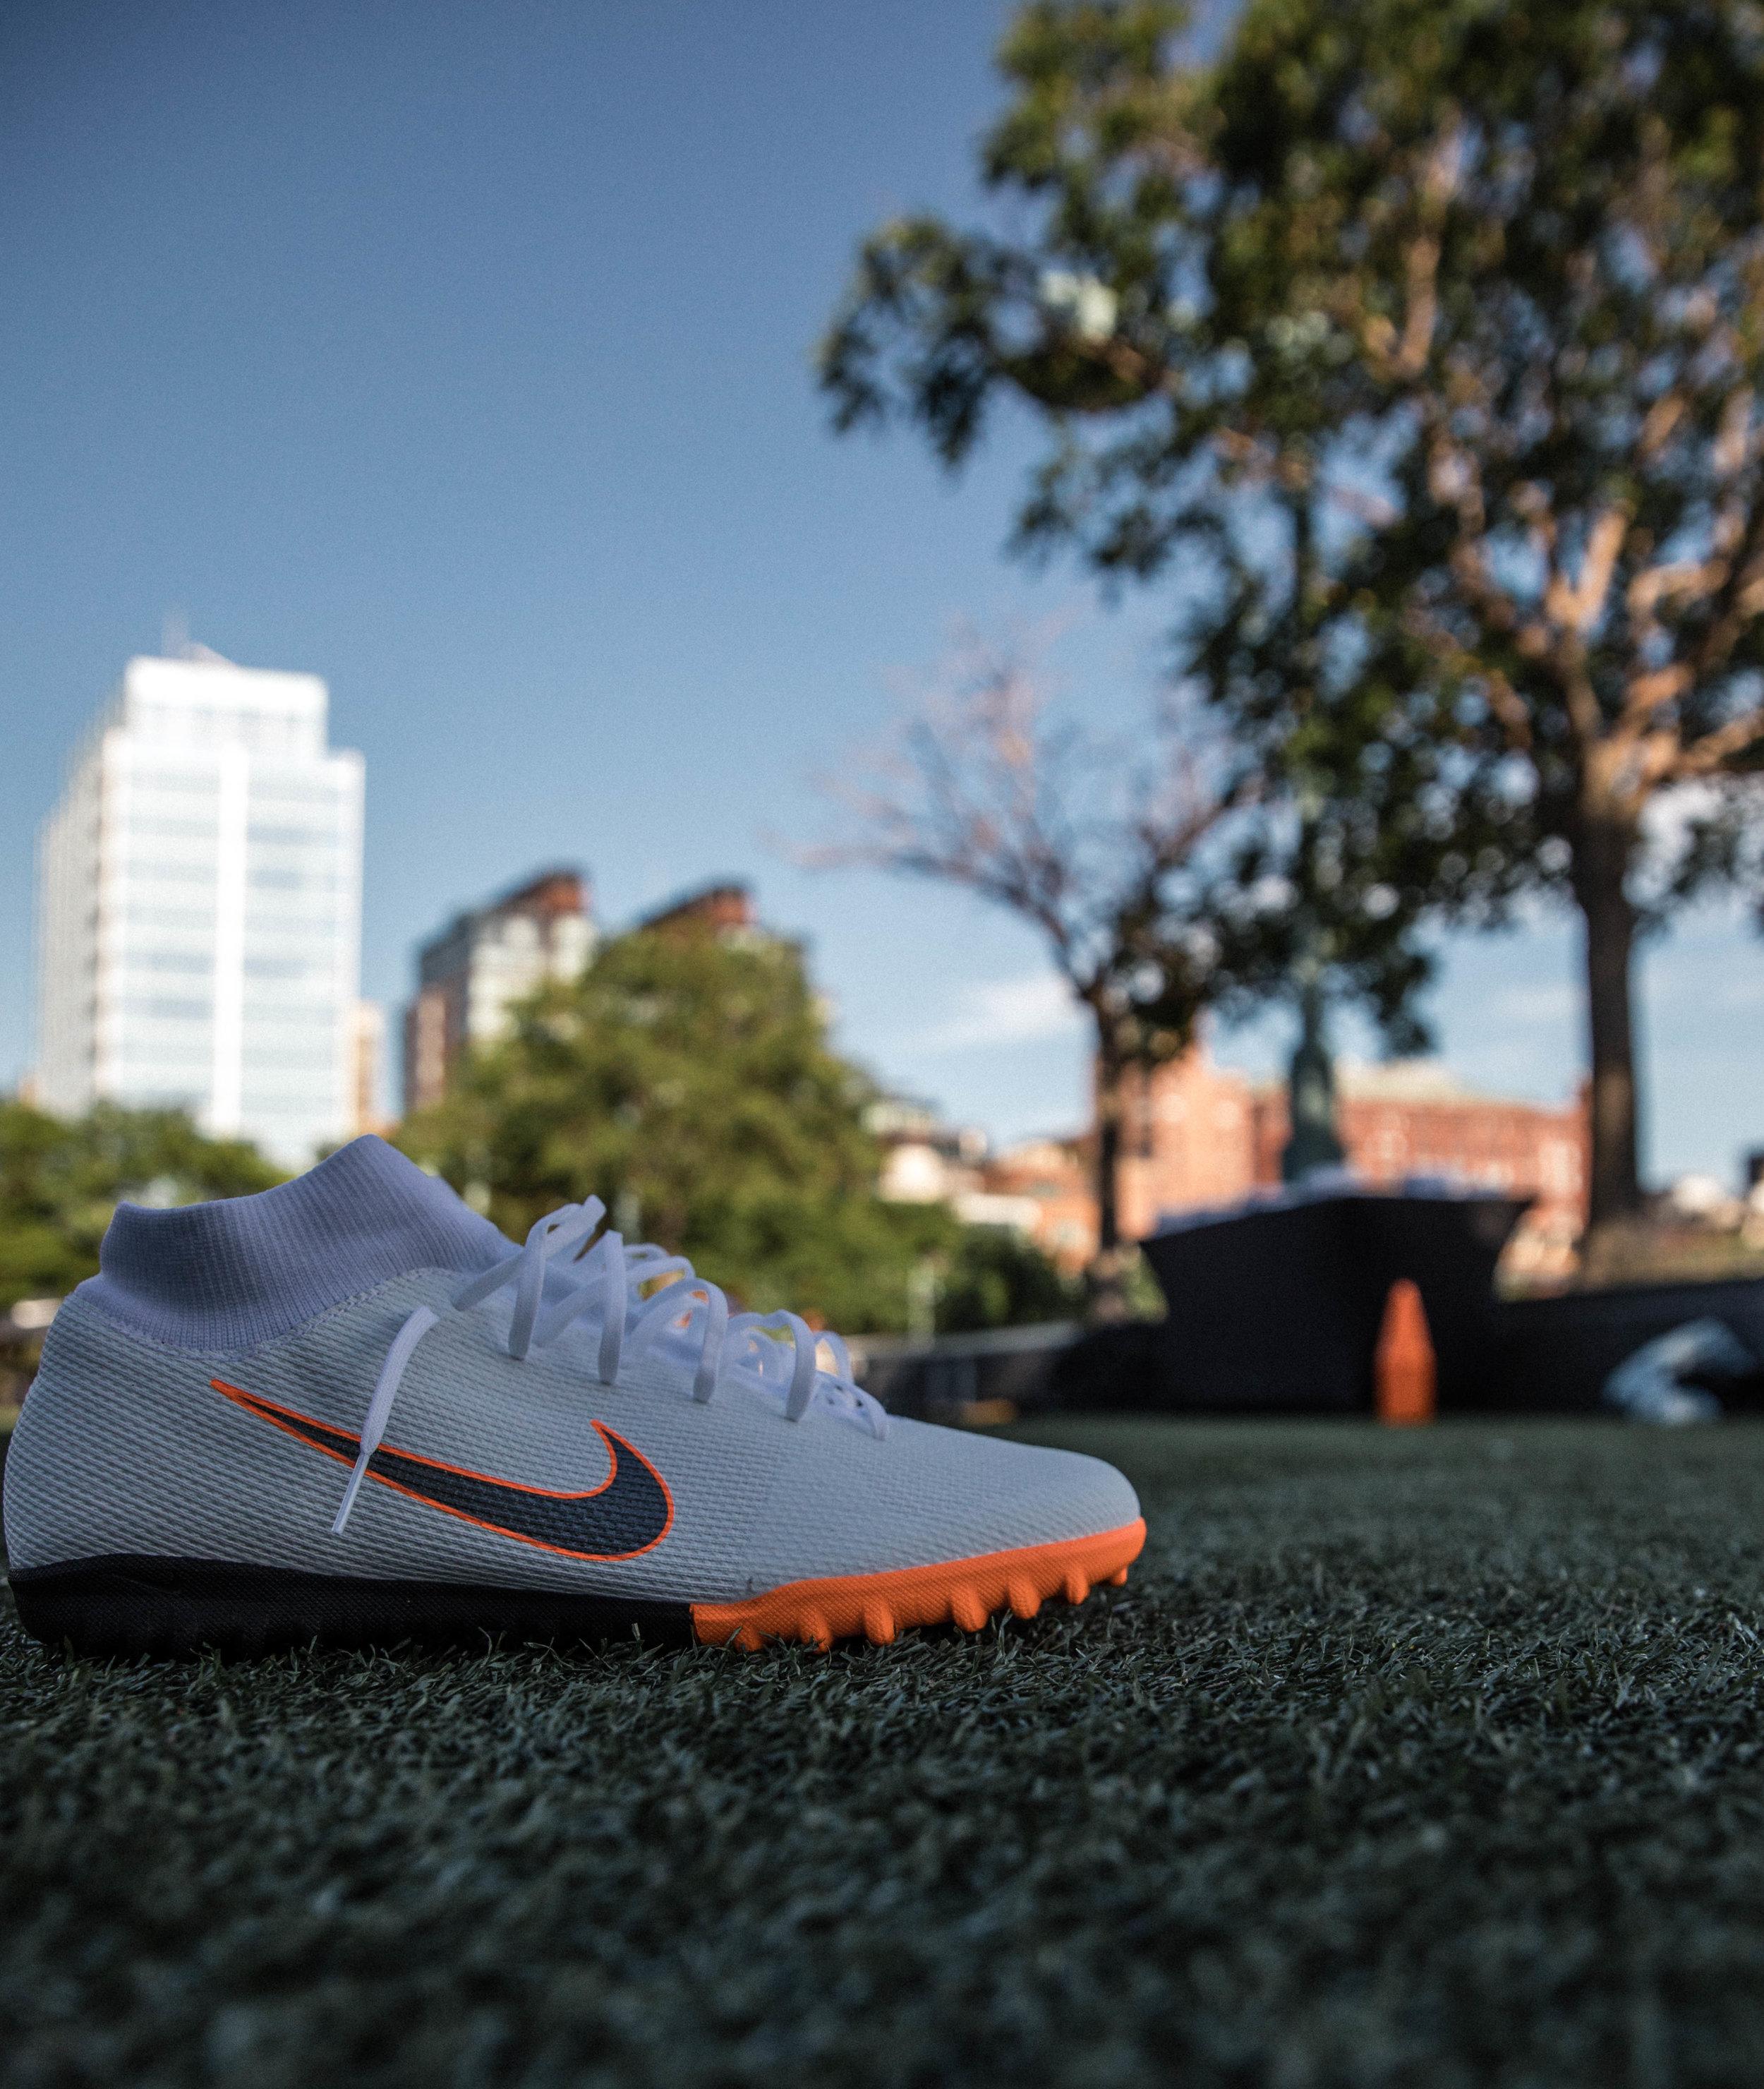 Football_Mon_Amour_Nike_NYC_11.jpg